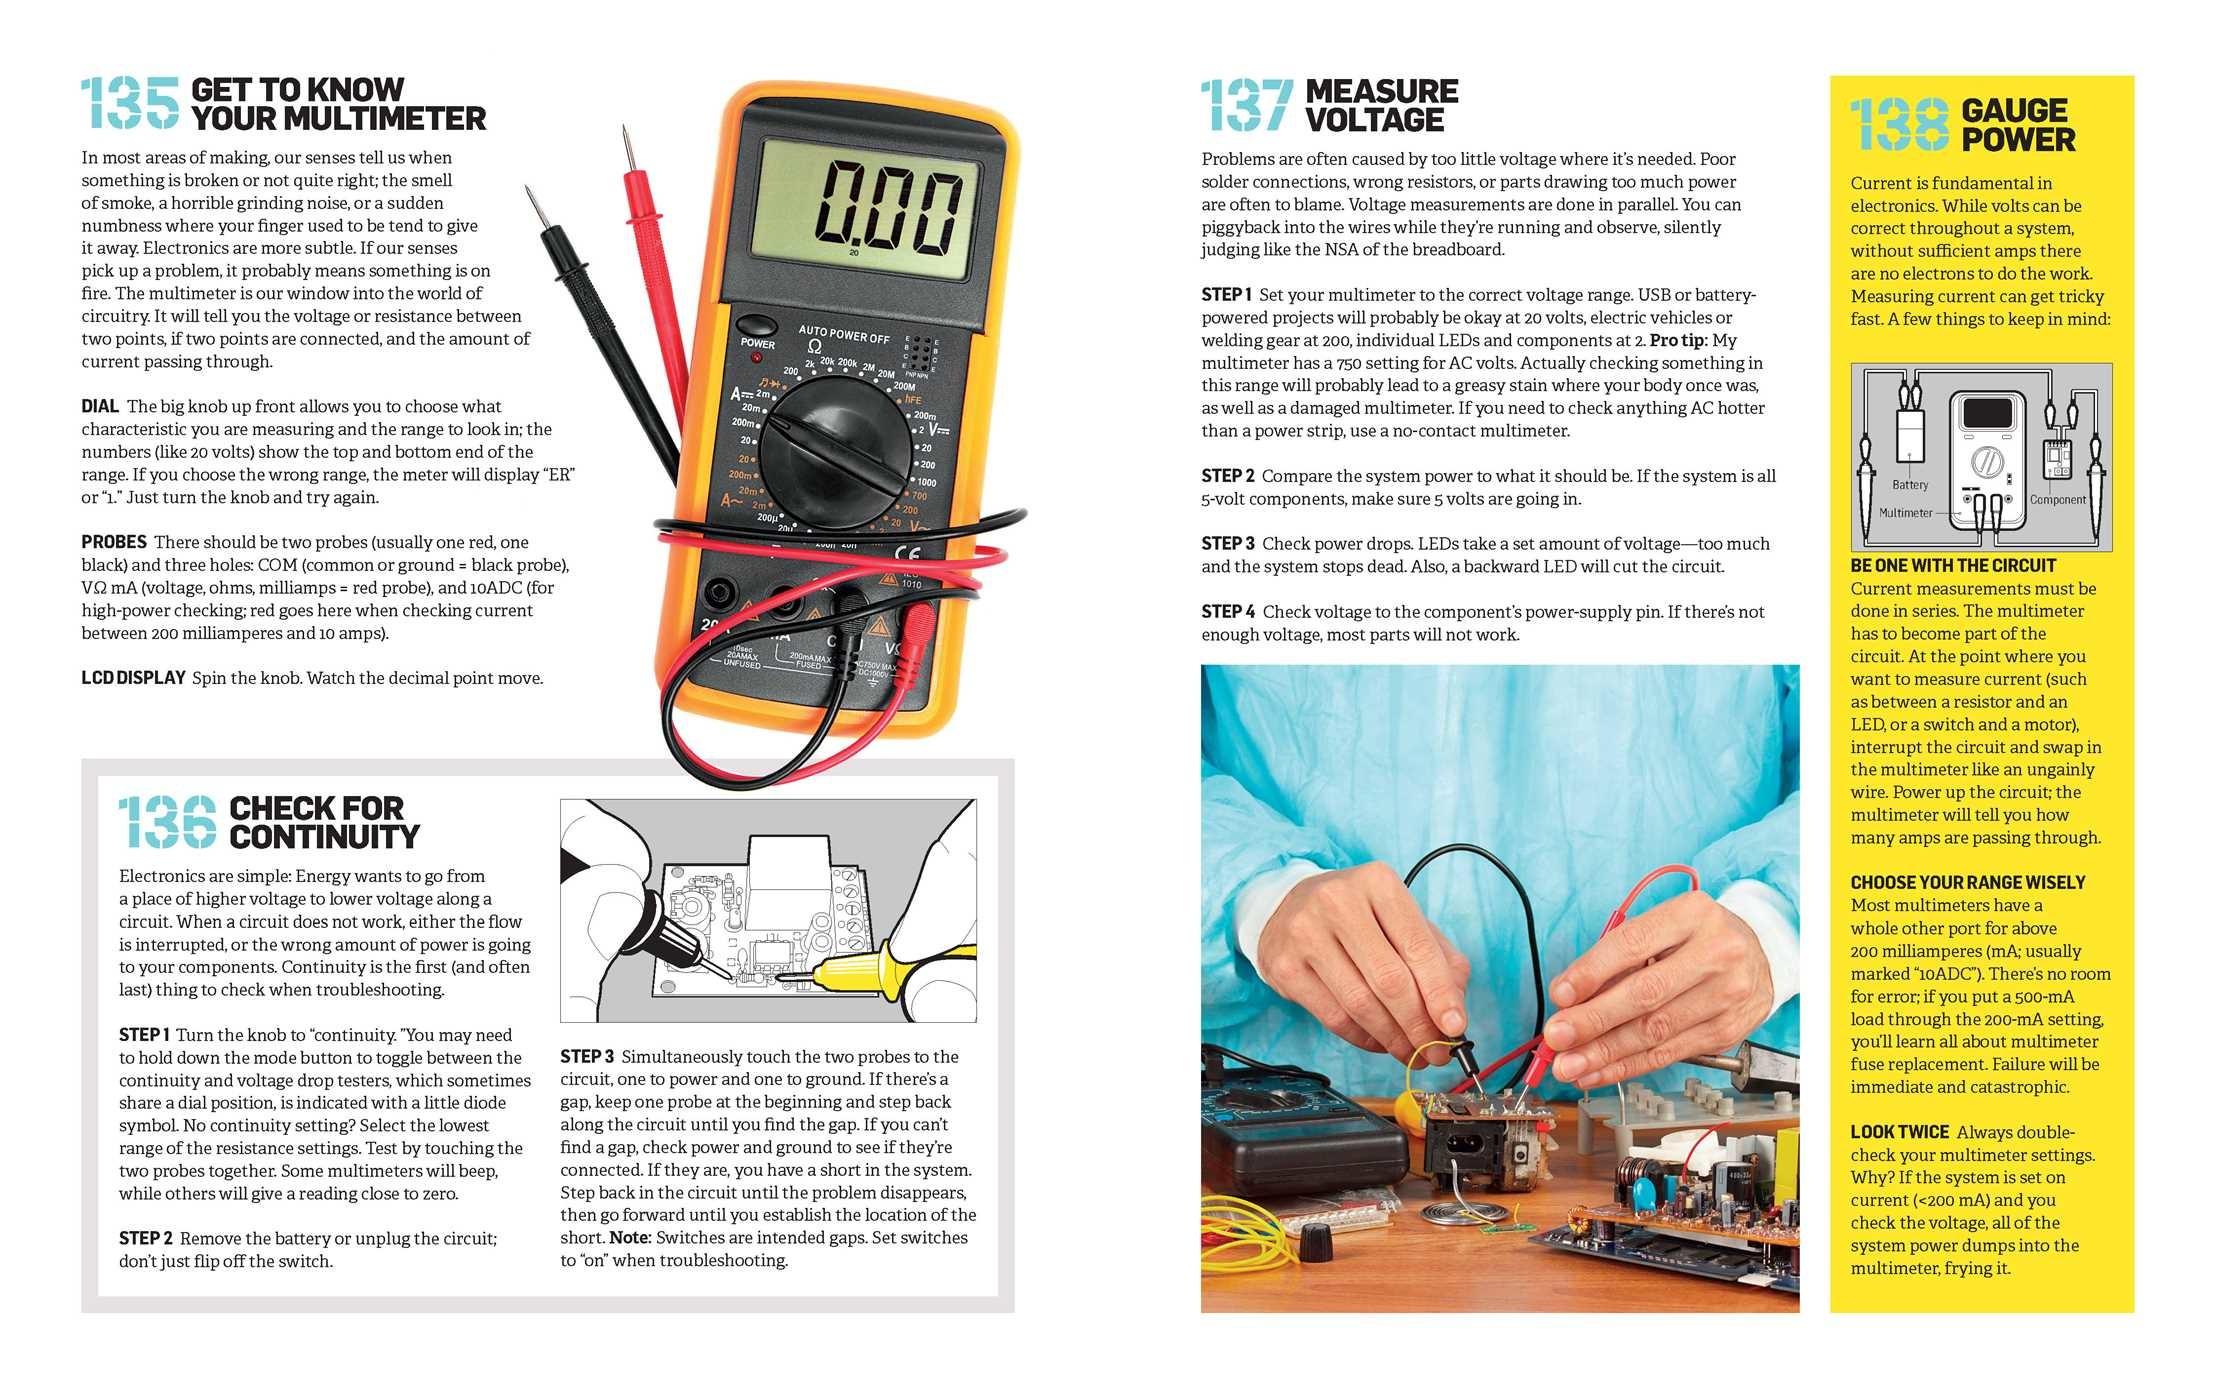 The big book of maker skills (popular science) 9781616287269.in03